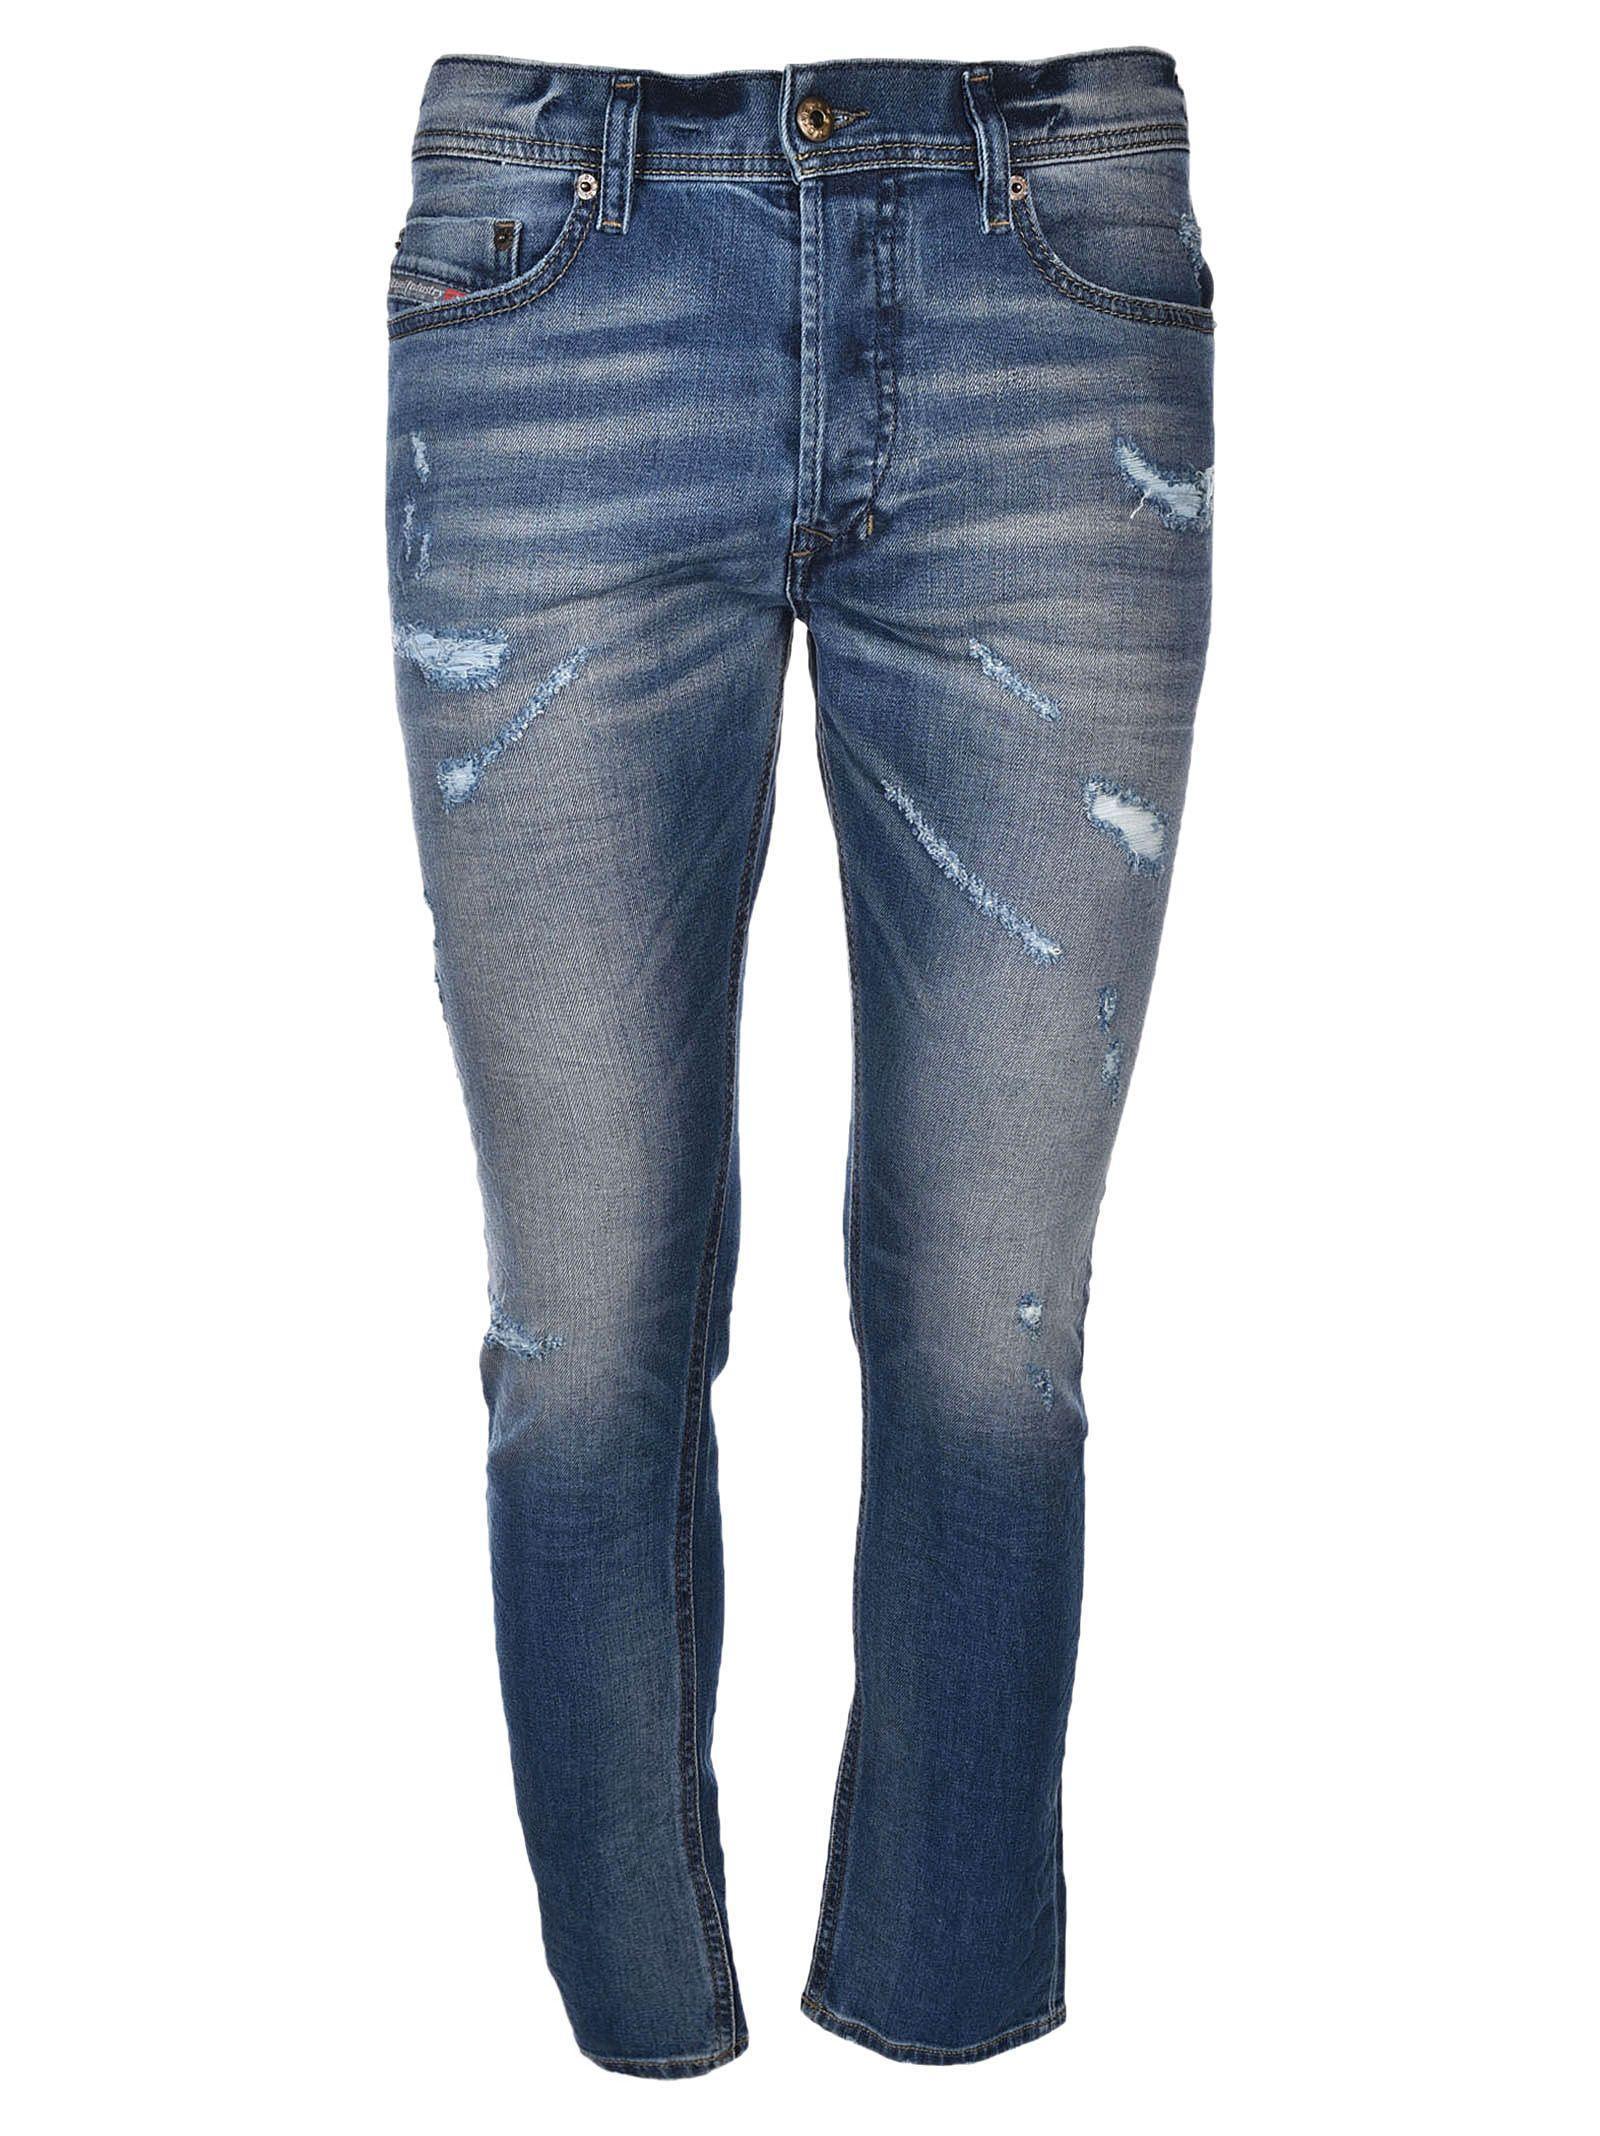 Diesel Semi-distressed Jeans In Blue